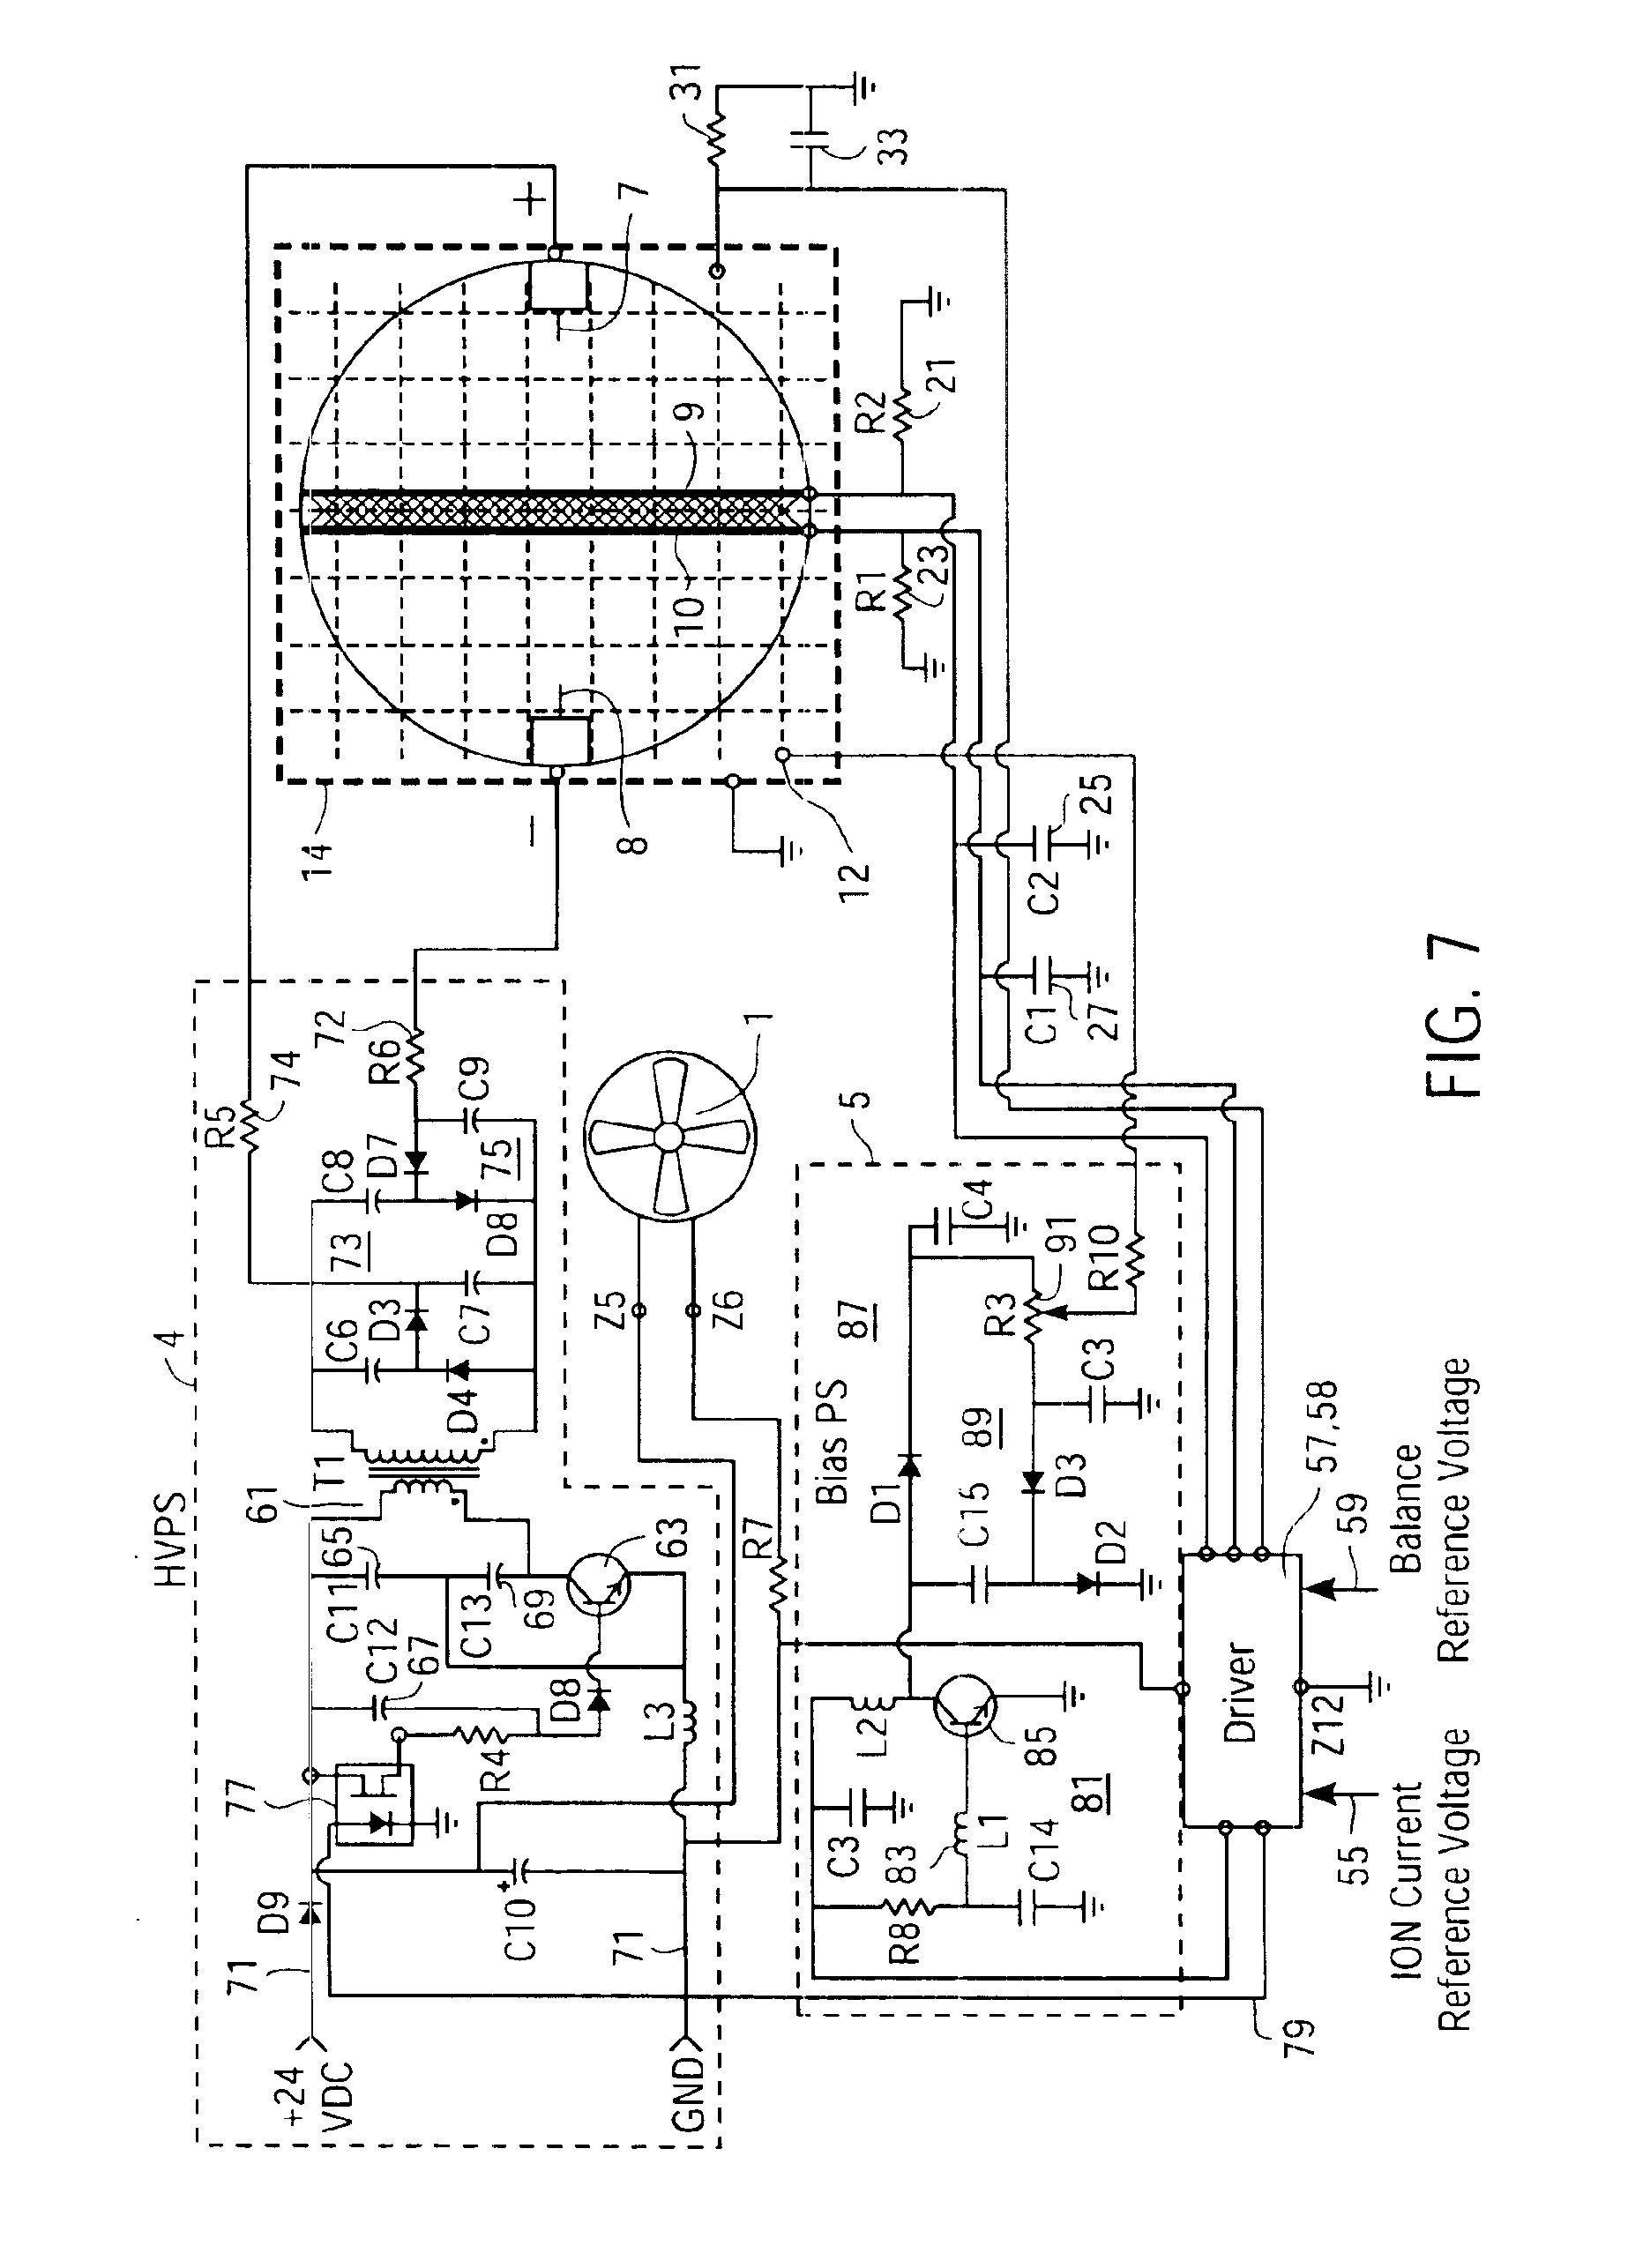 circuit board schematics [ 1846 x 2572 Pixel ]